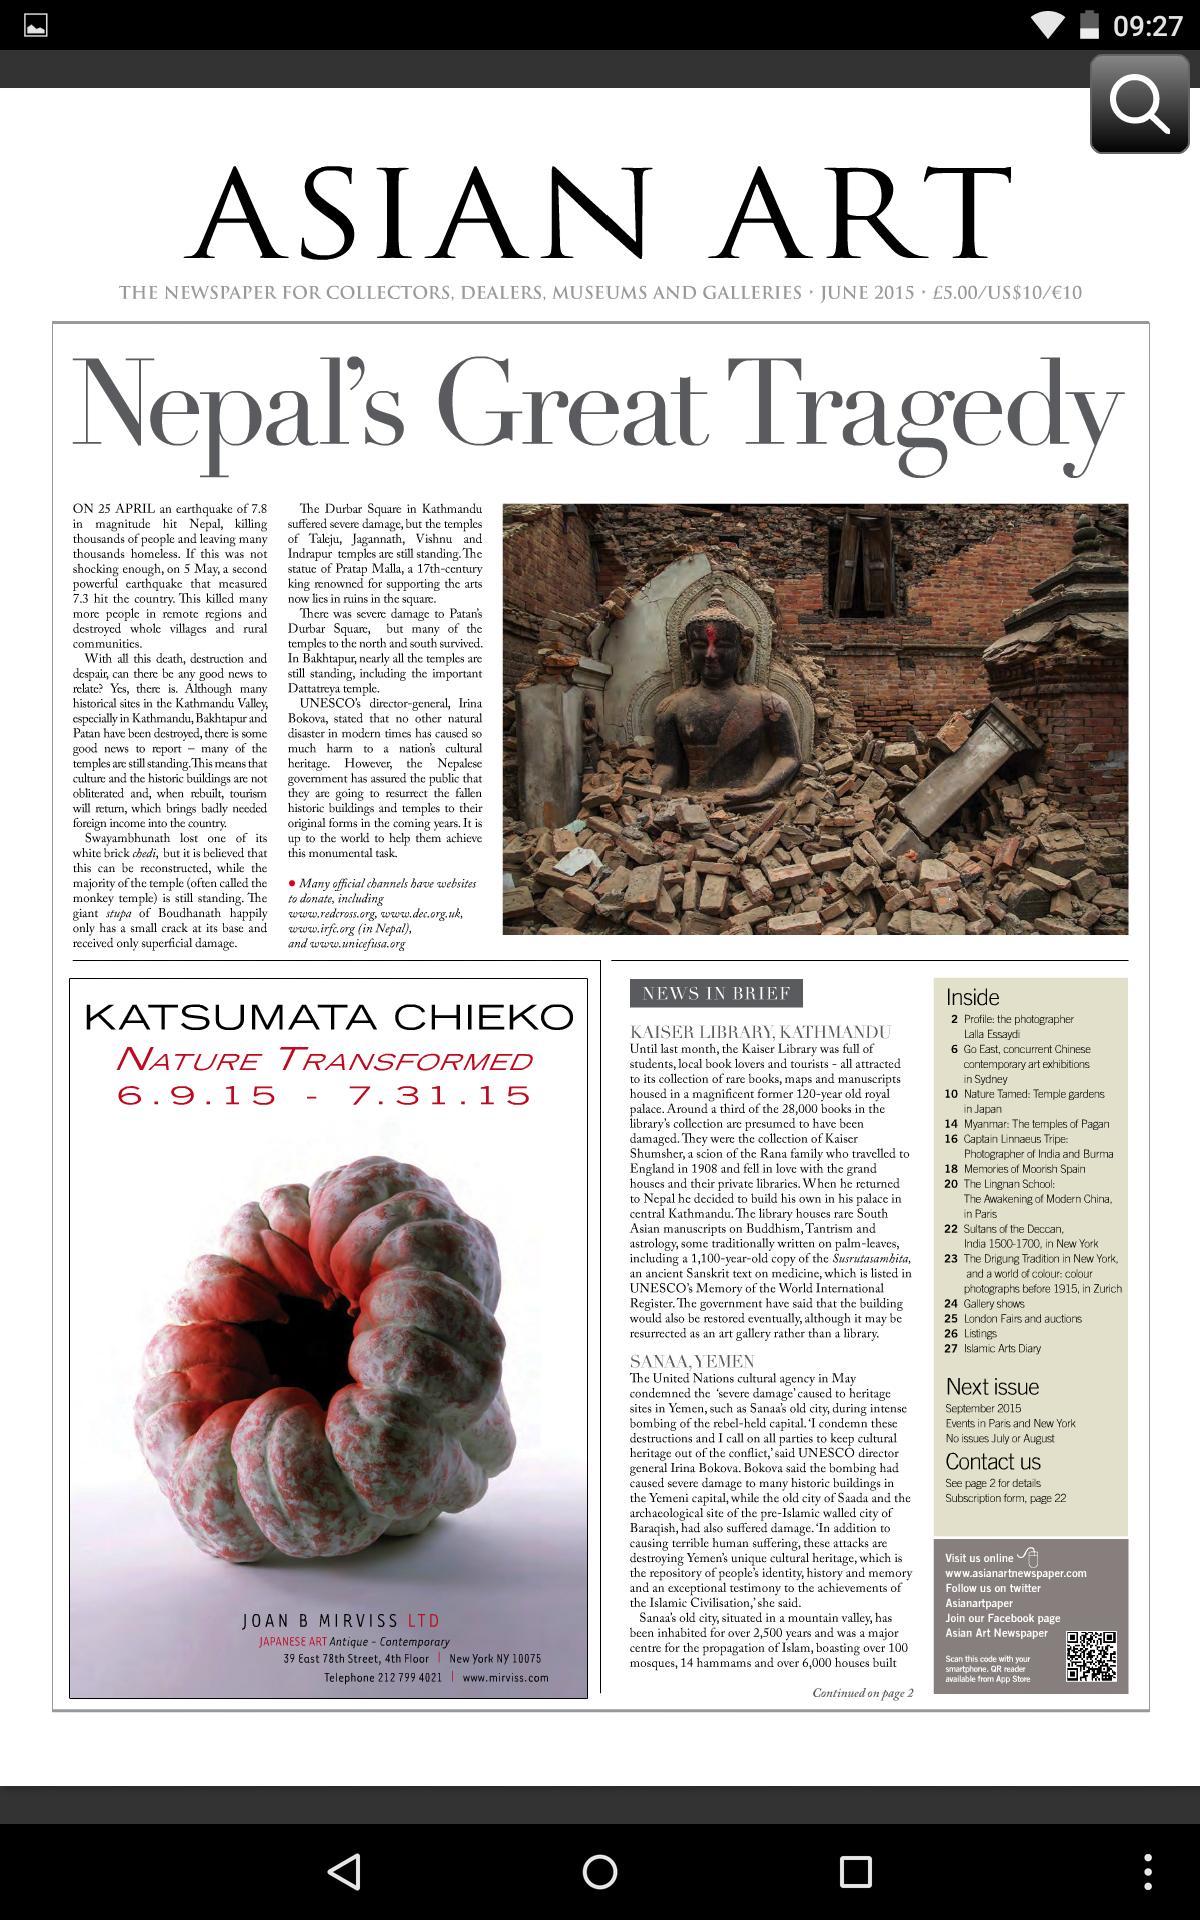 Asian Art Newspaper   Digital for Android   APK Download